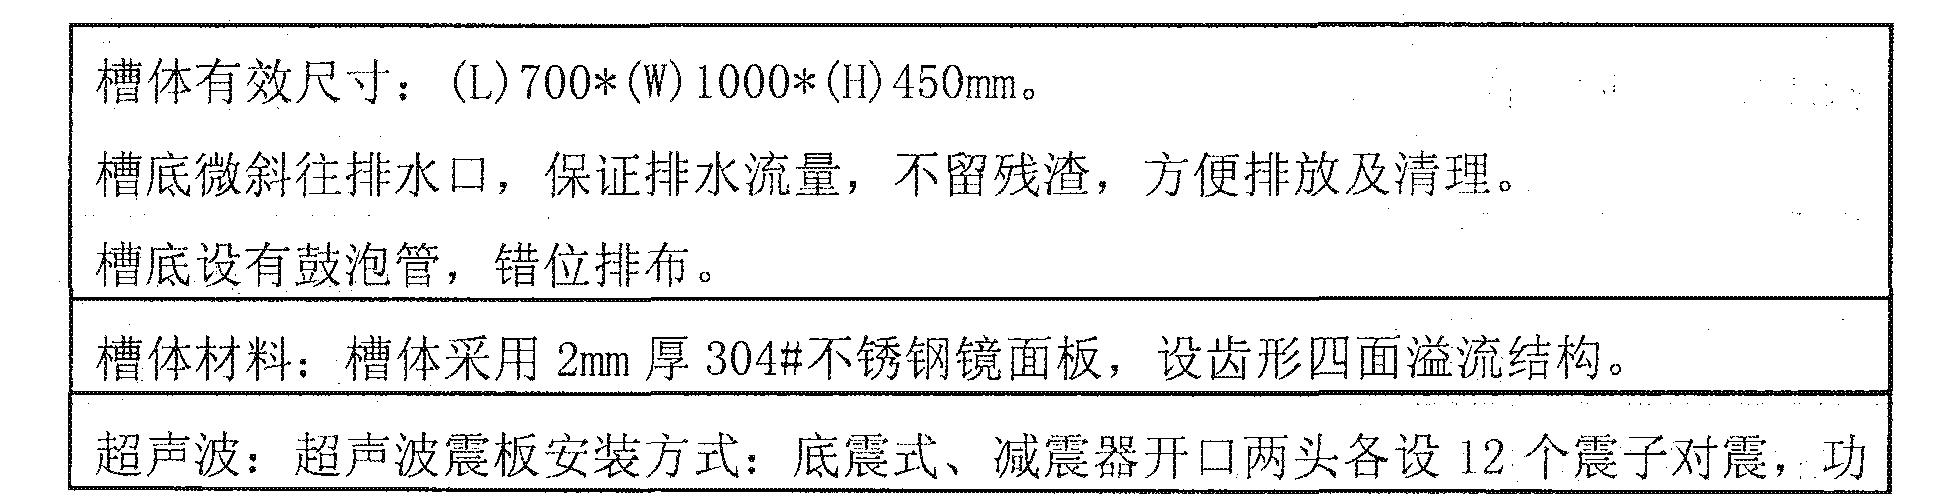 Figure CN204035120UD00102